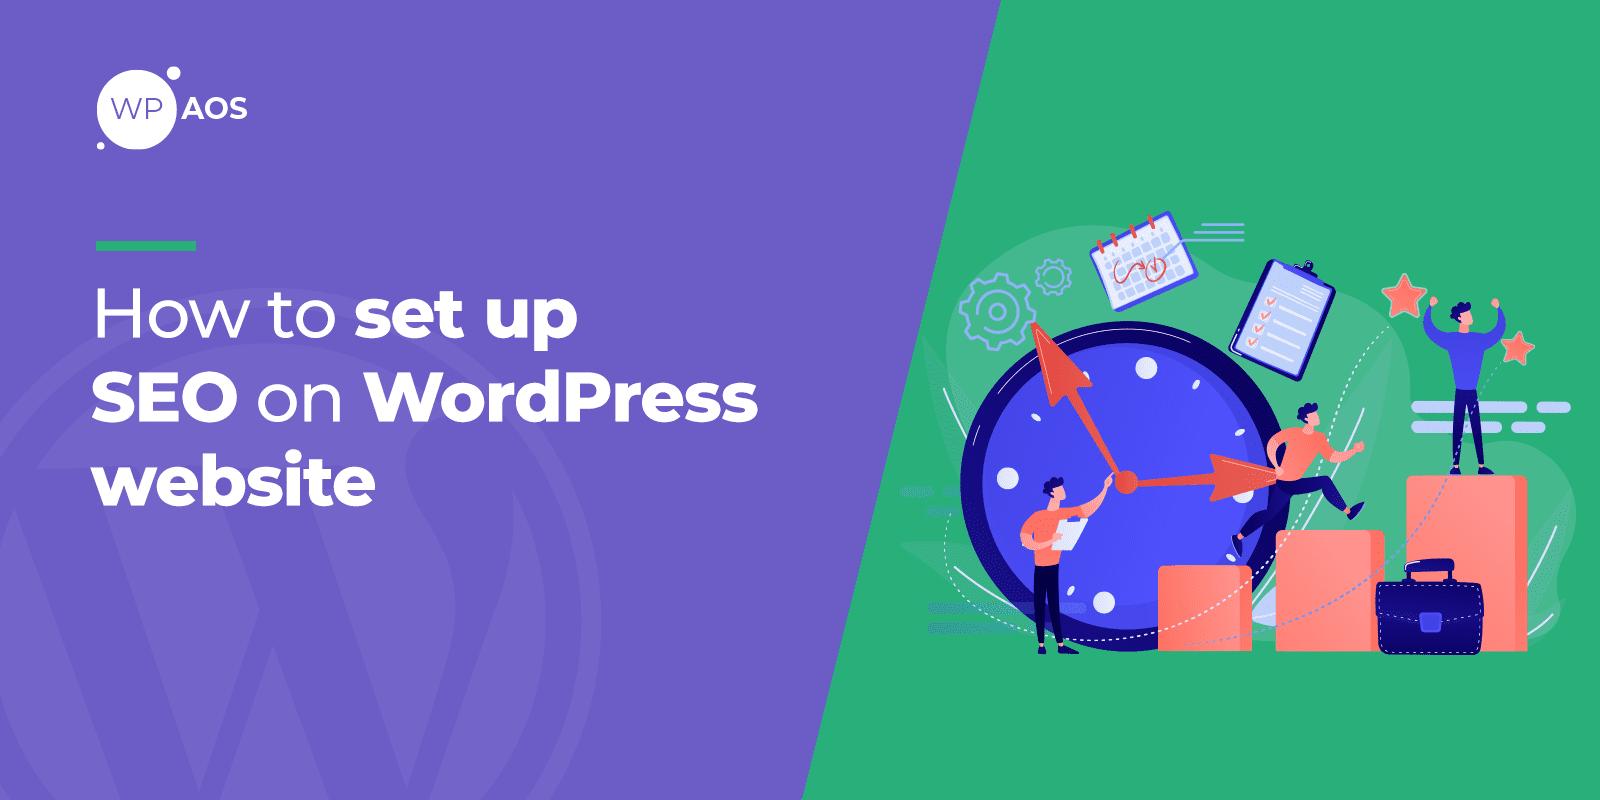 How to set up SEO on WordPress, Google Optimization, website maintenance, wpaos